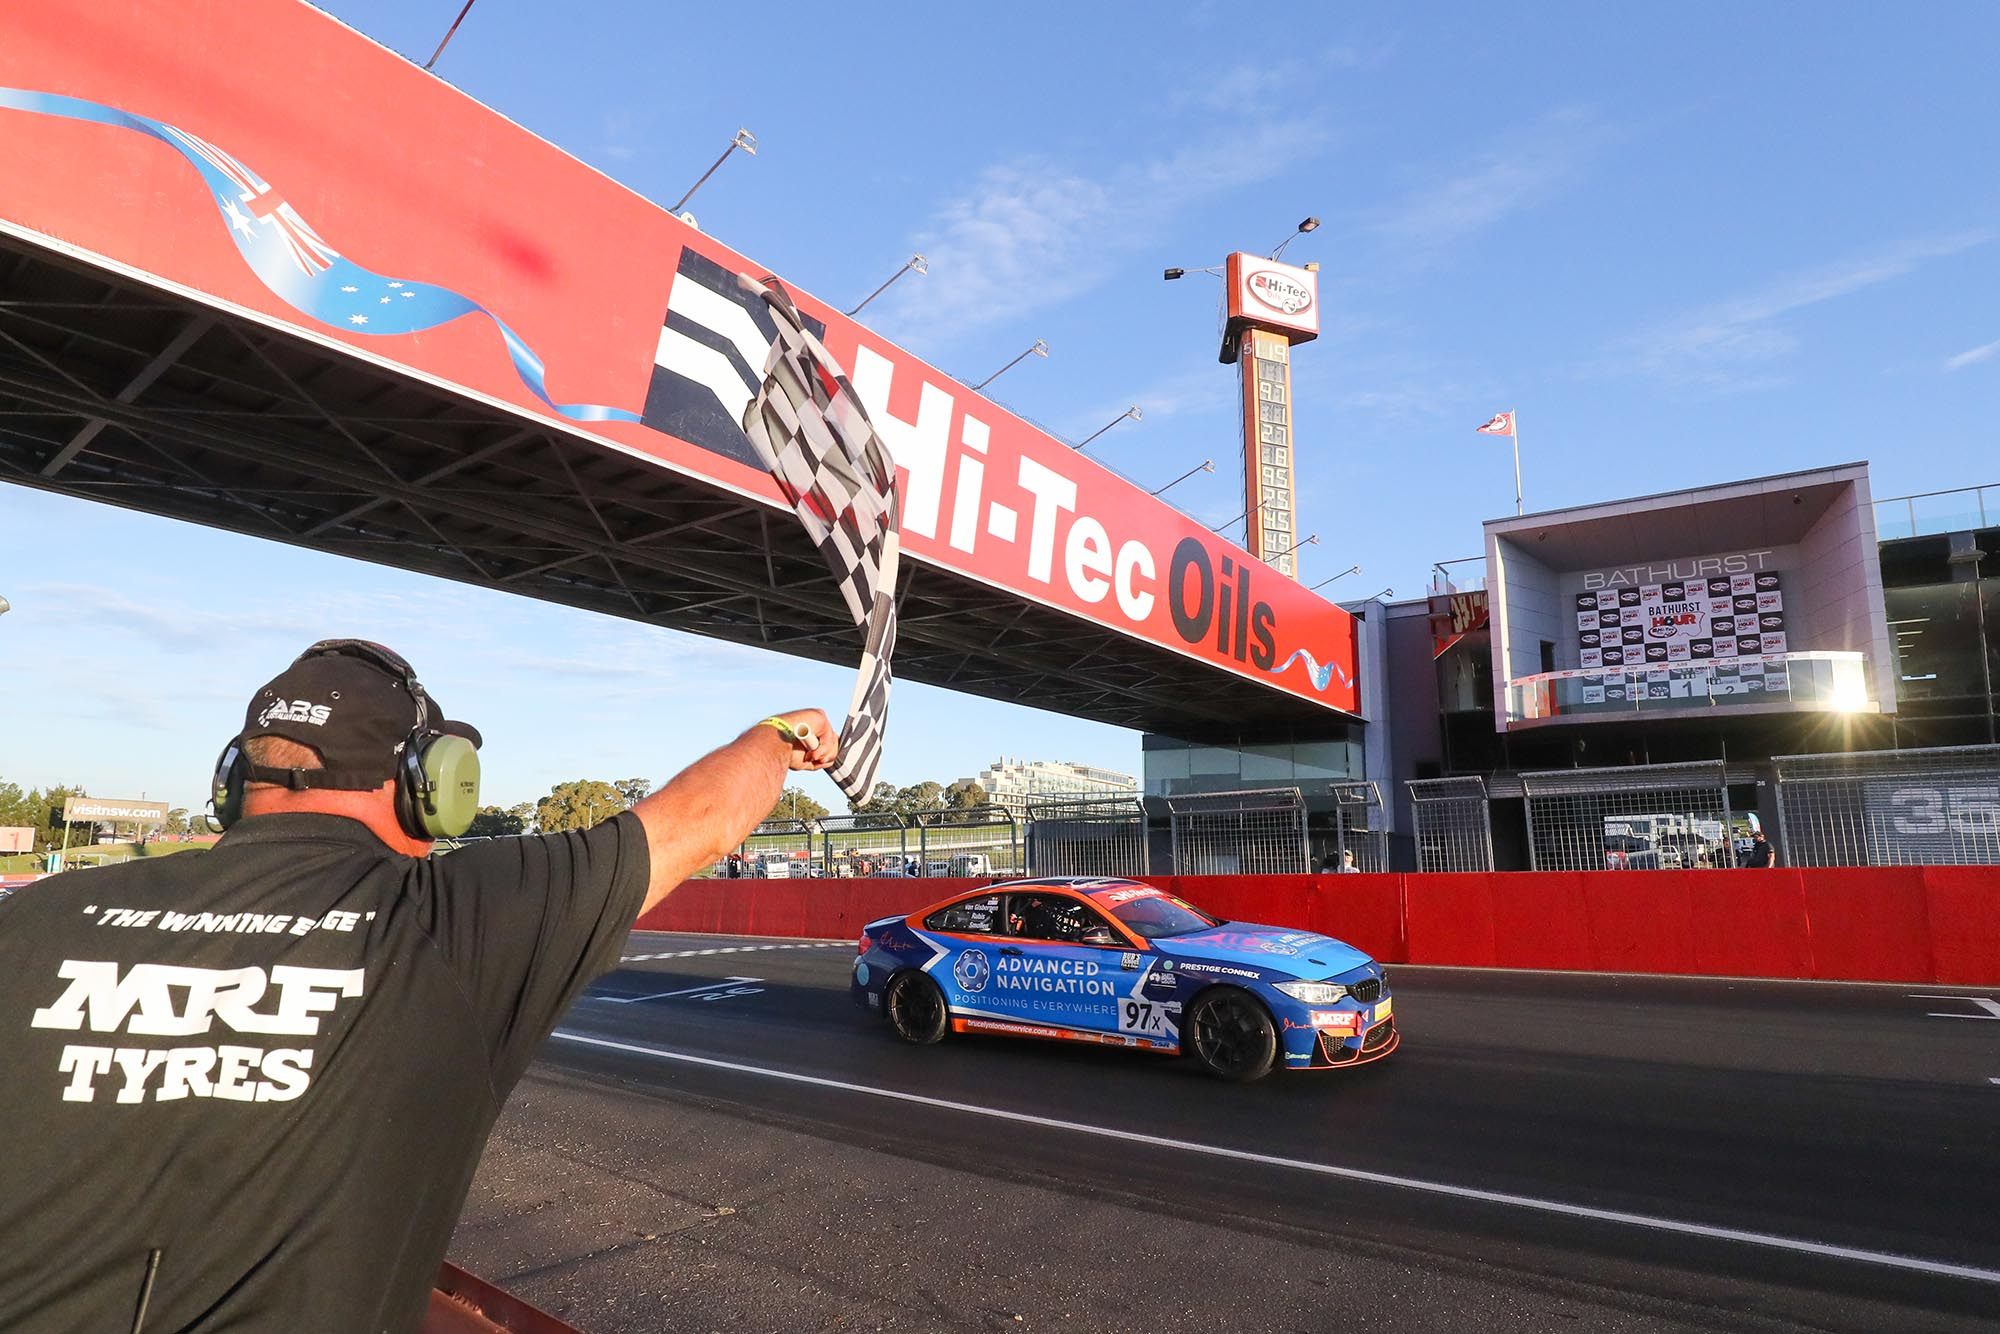 Shane van Gisbergen leads BMW team to Hi-Tec Oils Bathurst 6 Hour victory